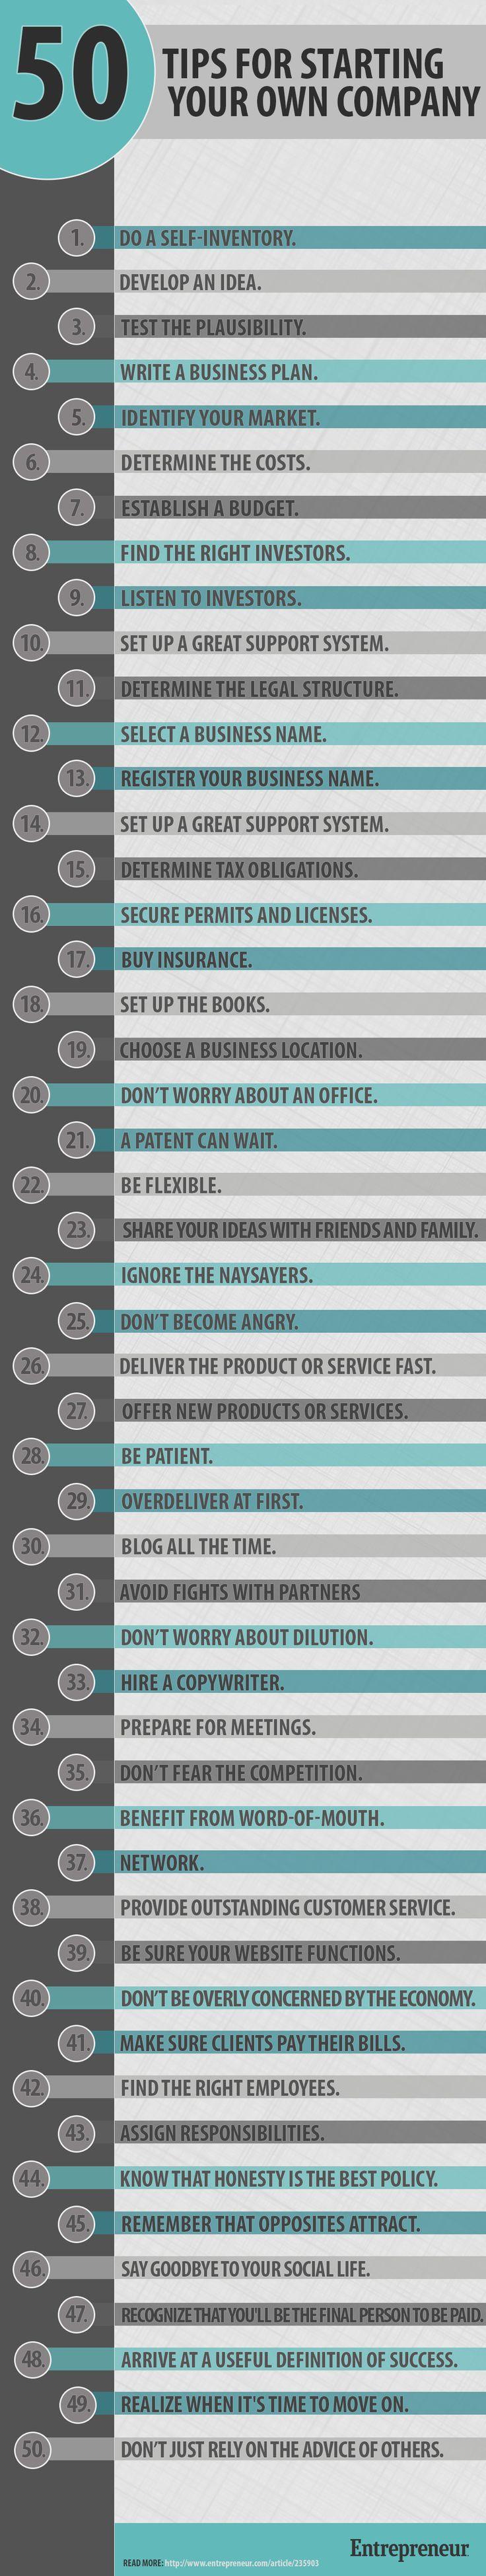 Entrepreneur-Magazine-Infographic (1)